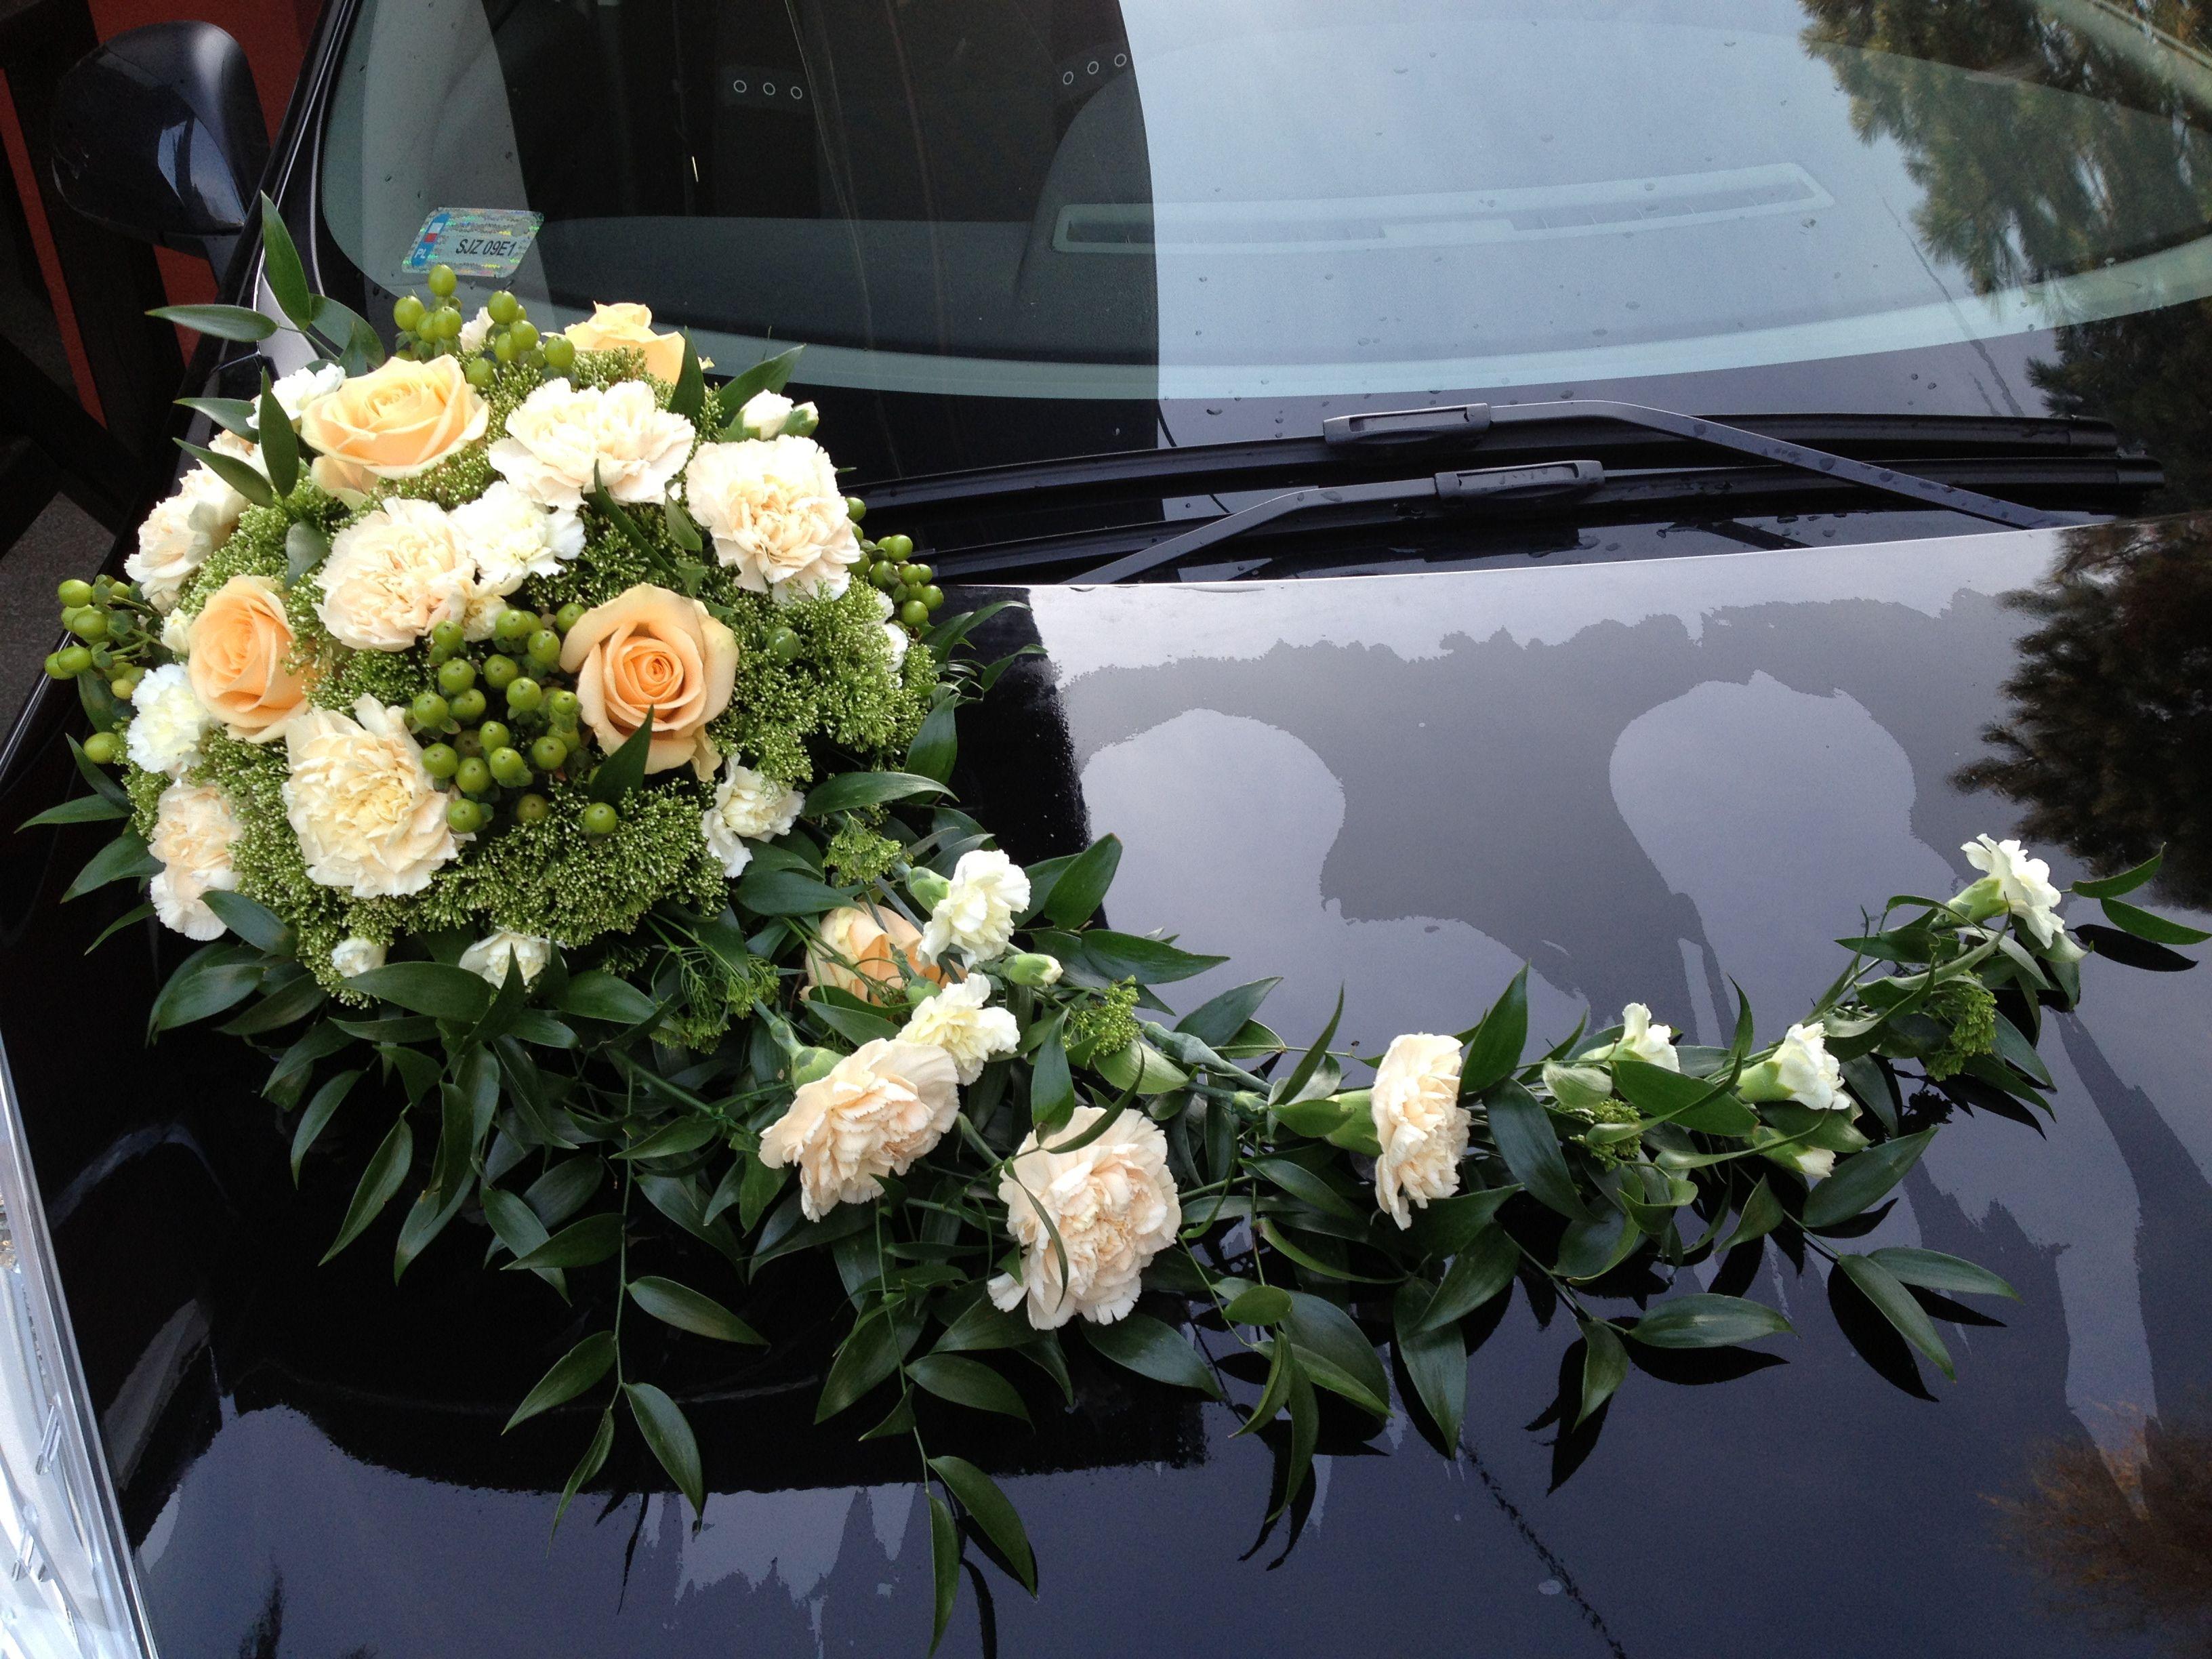 Wedding Car Decoration Wedding Car Wedding Car Deco Wedding